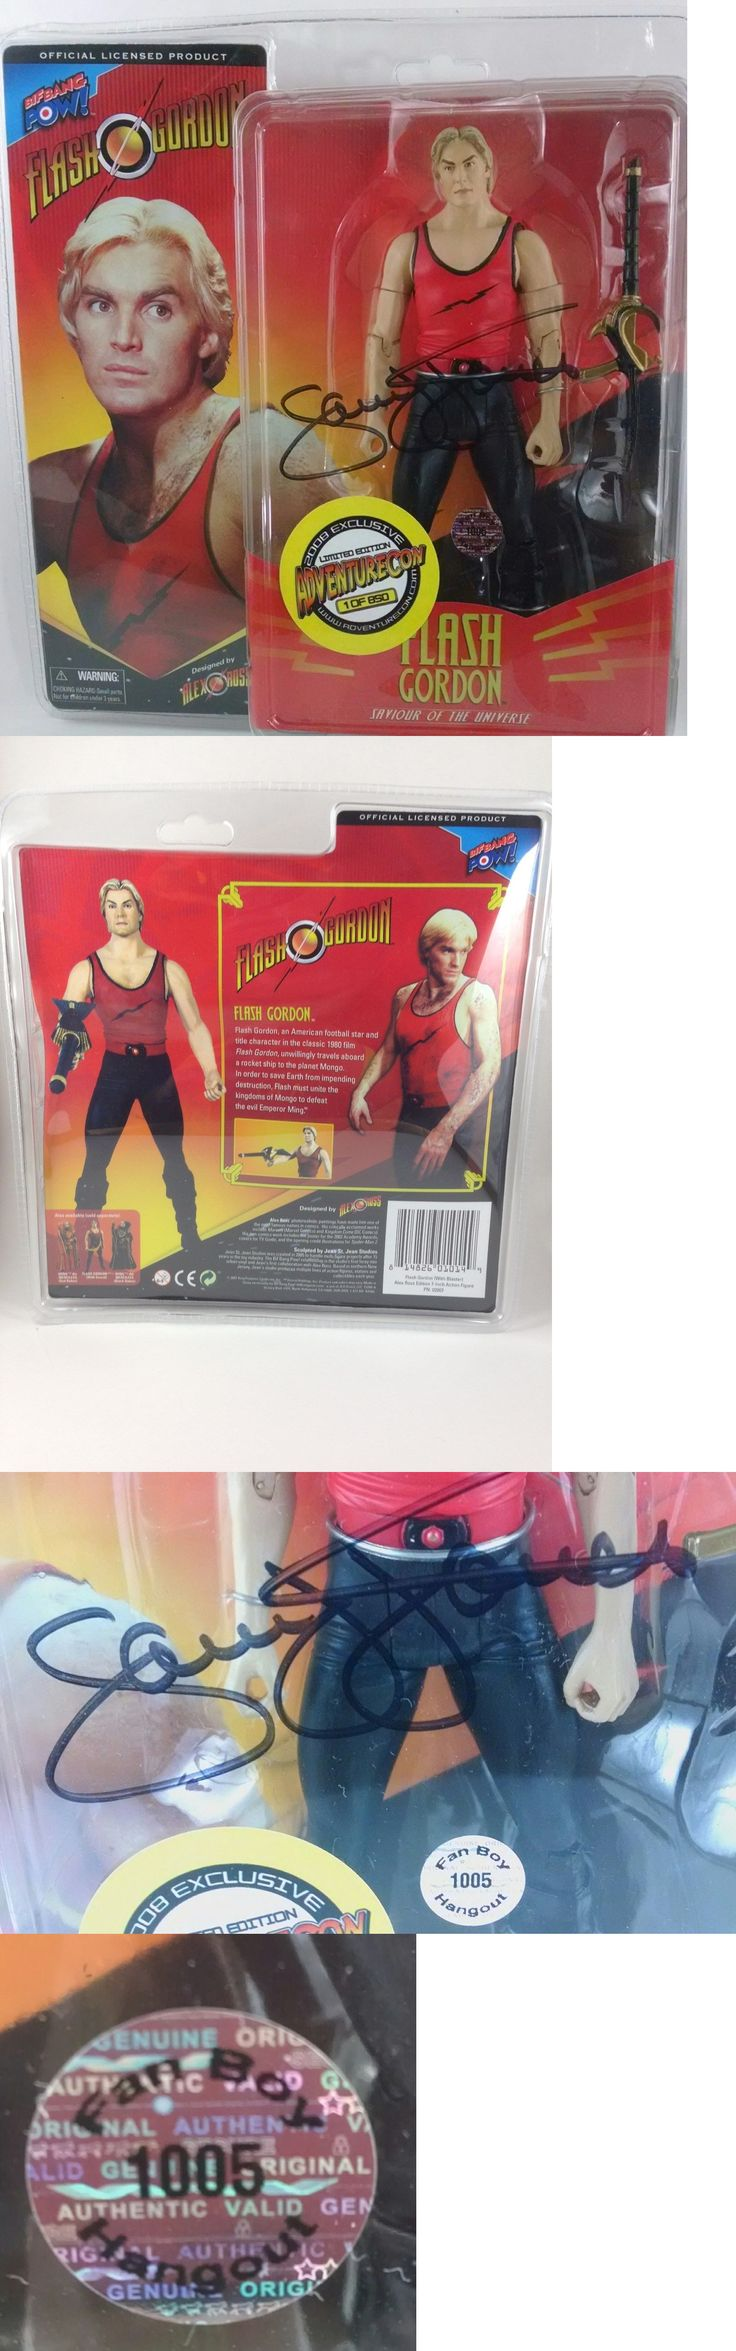 Lead Toys and Figures 152938: Flash Gordon 2008 Bif Bangpow Rare Action Figure *Autographed* By Sam J. Jones -> BUY IT NOW ONLY: $57 on eBay!